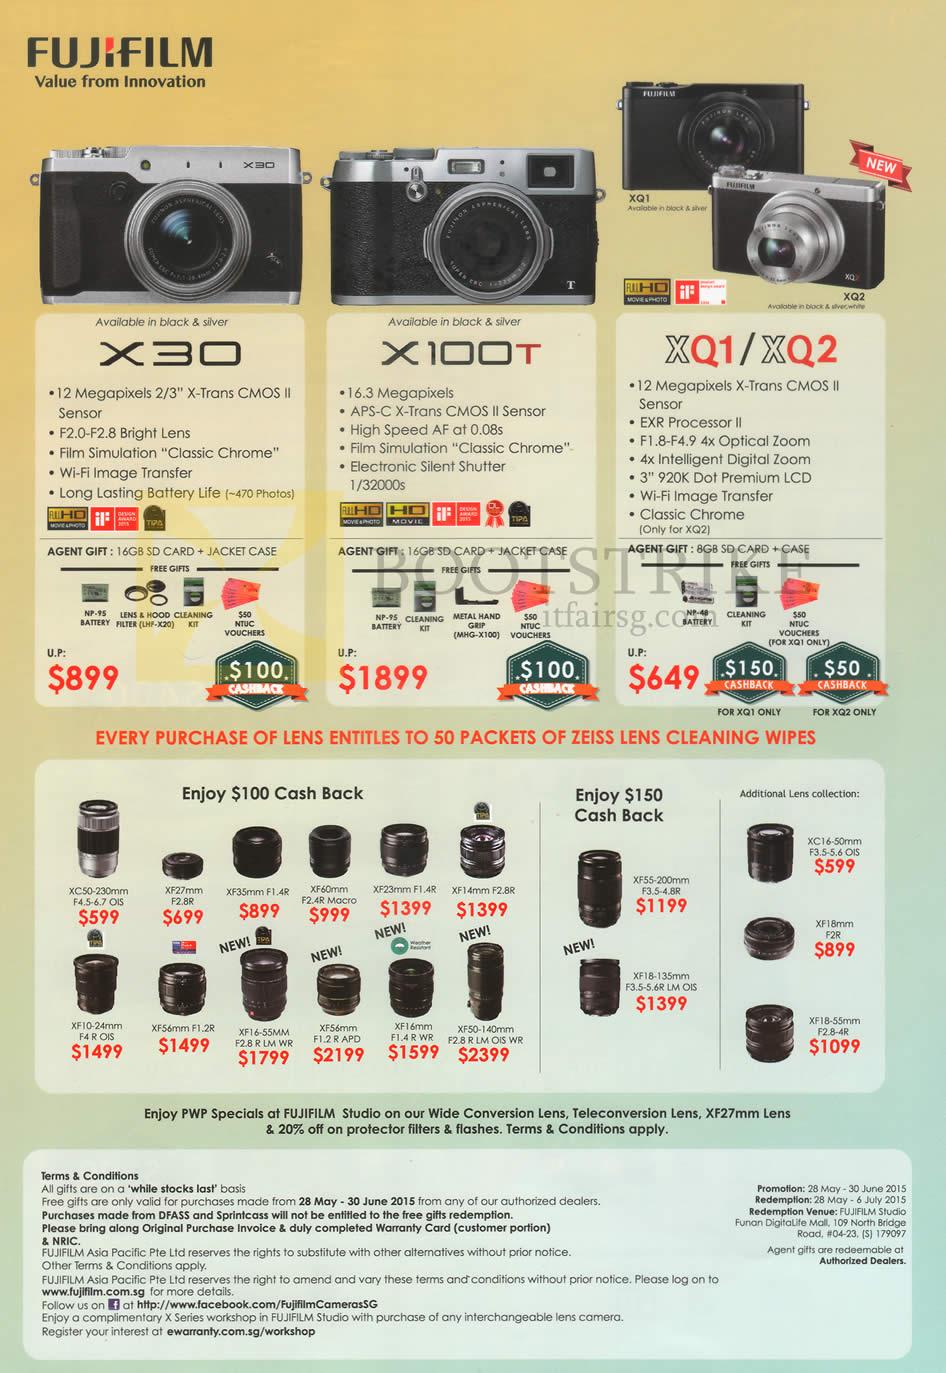 Fujifilm Digital Cameras X30, X100T, XQ1, XQ2, Lenses. Lens Cleaning Wipes